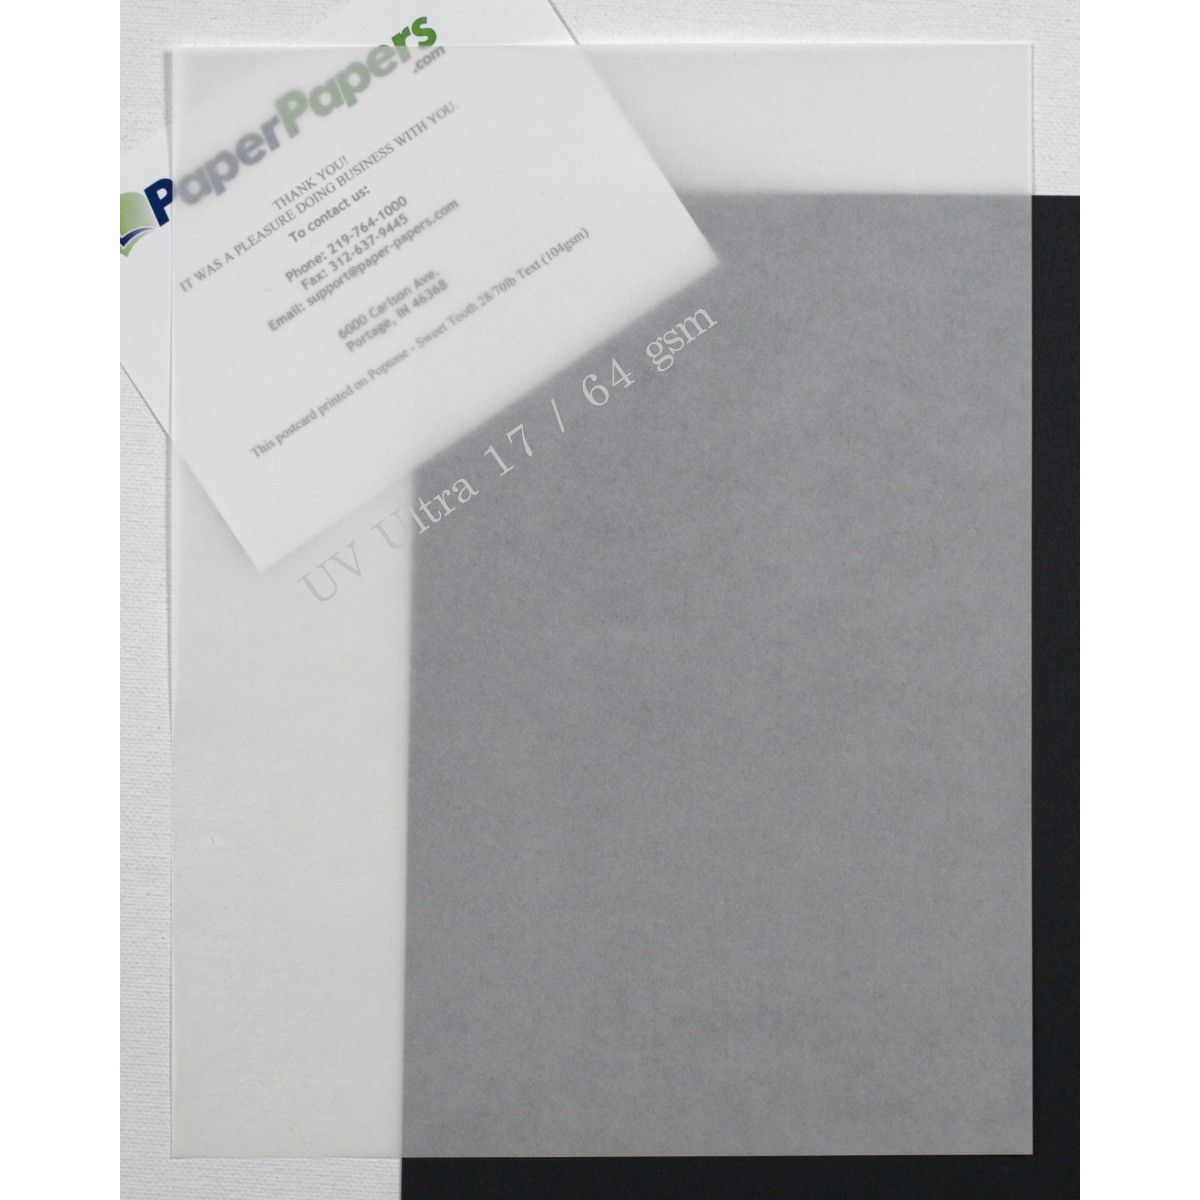 neenah uv ultra ii translucent vellum white 8 5 x 11 paper 17lb